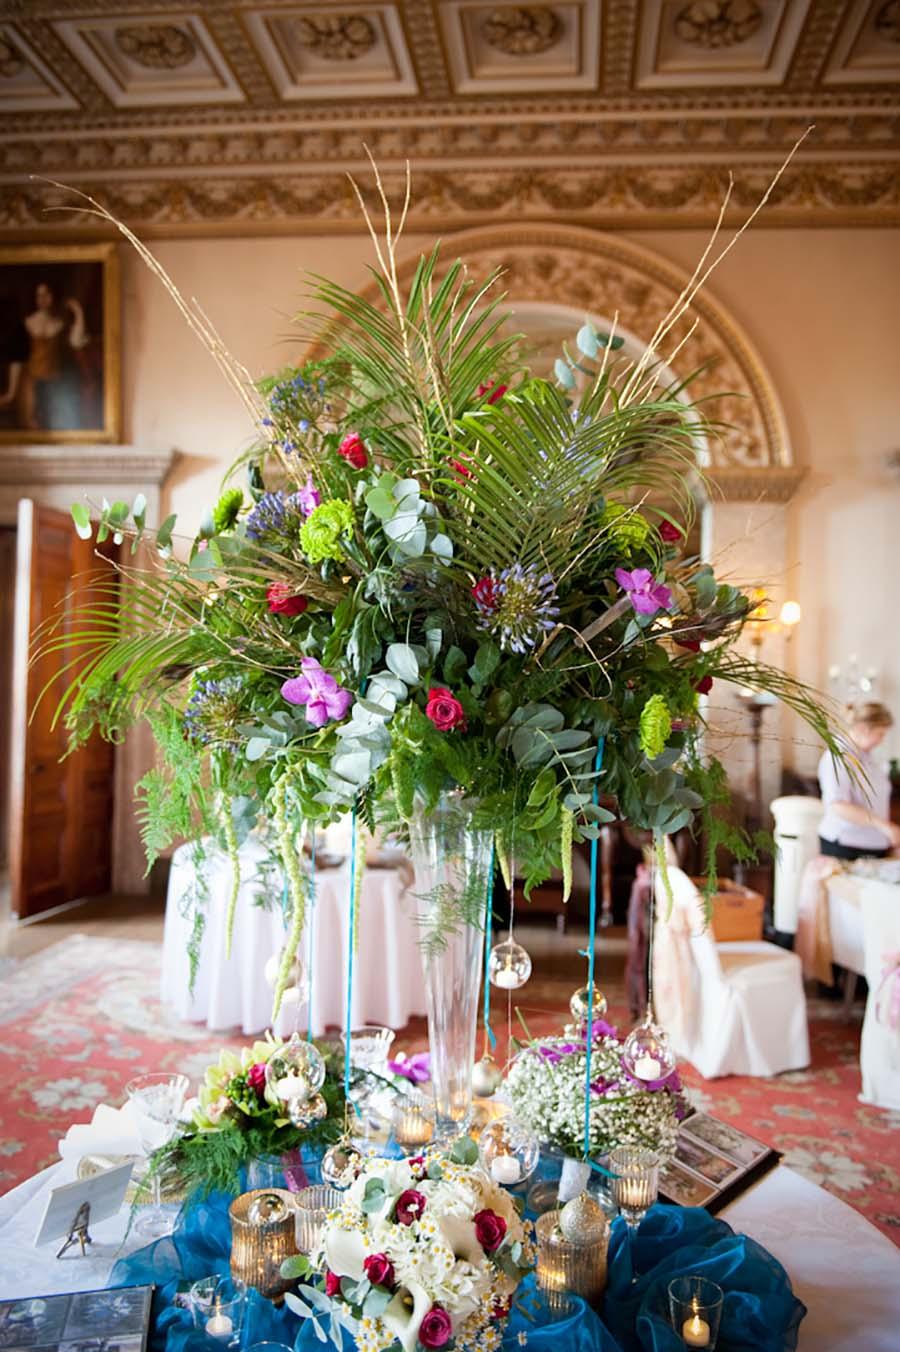 Buckinghams-at-belvoir-castle-wedding-fair-rachael-connerton-photography-106